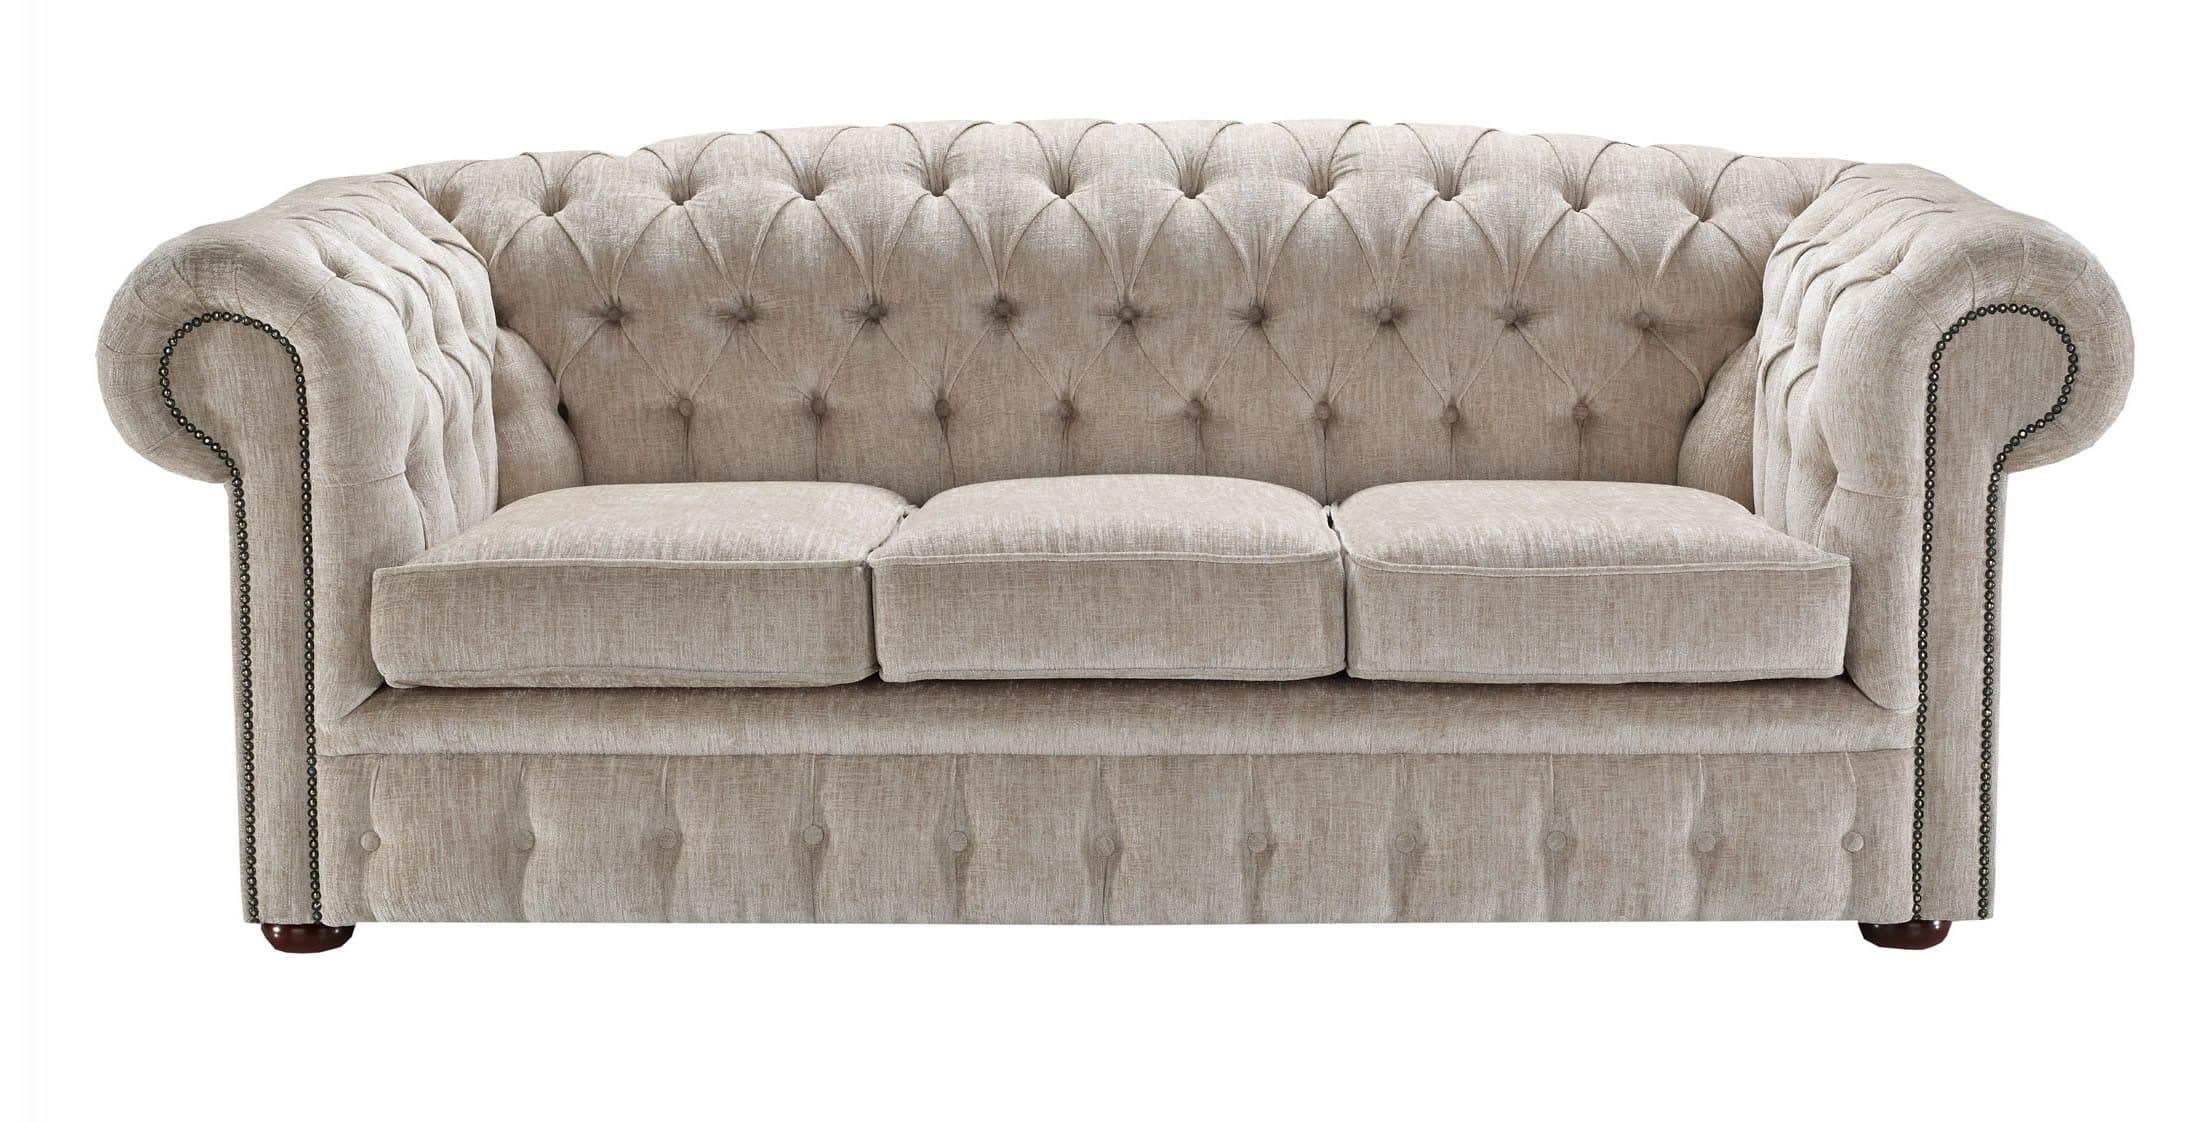 leather and chenille sofa 3 seater rattan effect mini corner black exp del 21 best ideas material sofas